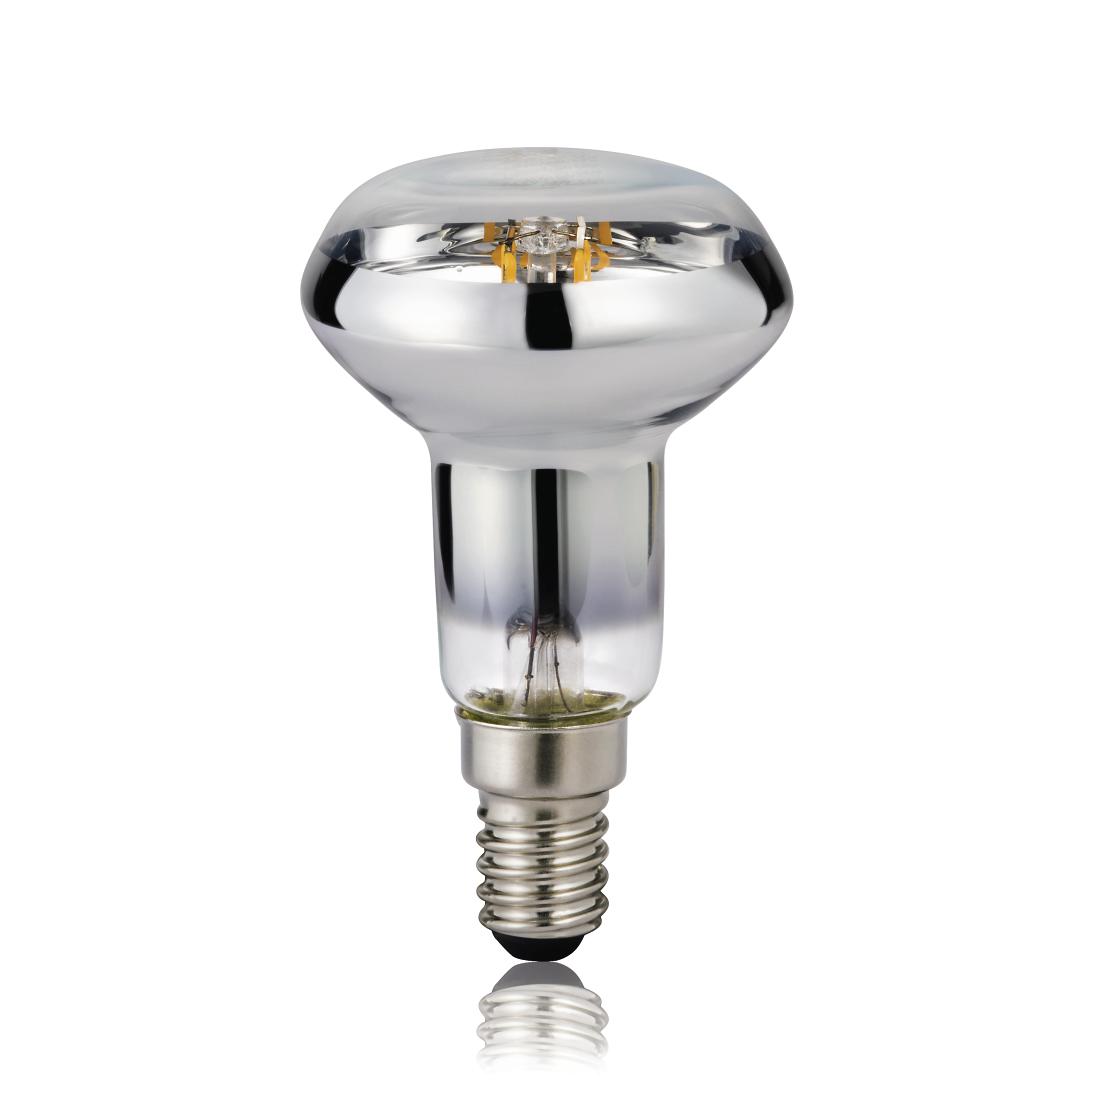 00112605 xavax led filament e14 320lm ersetzt 29w reflektorlampe r50 warmwei. Black Bedroom Furniture Sets. Home Design Ideas